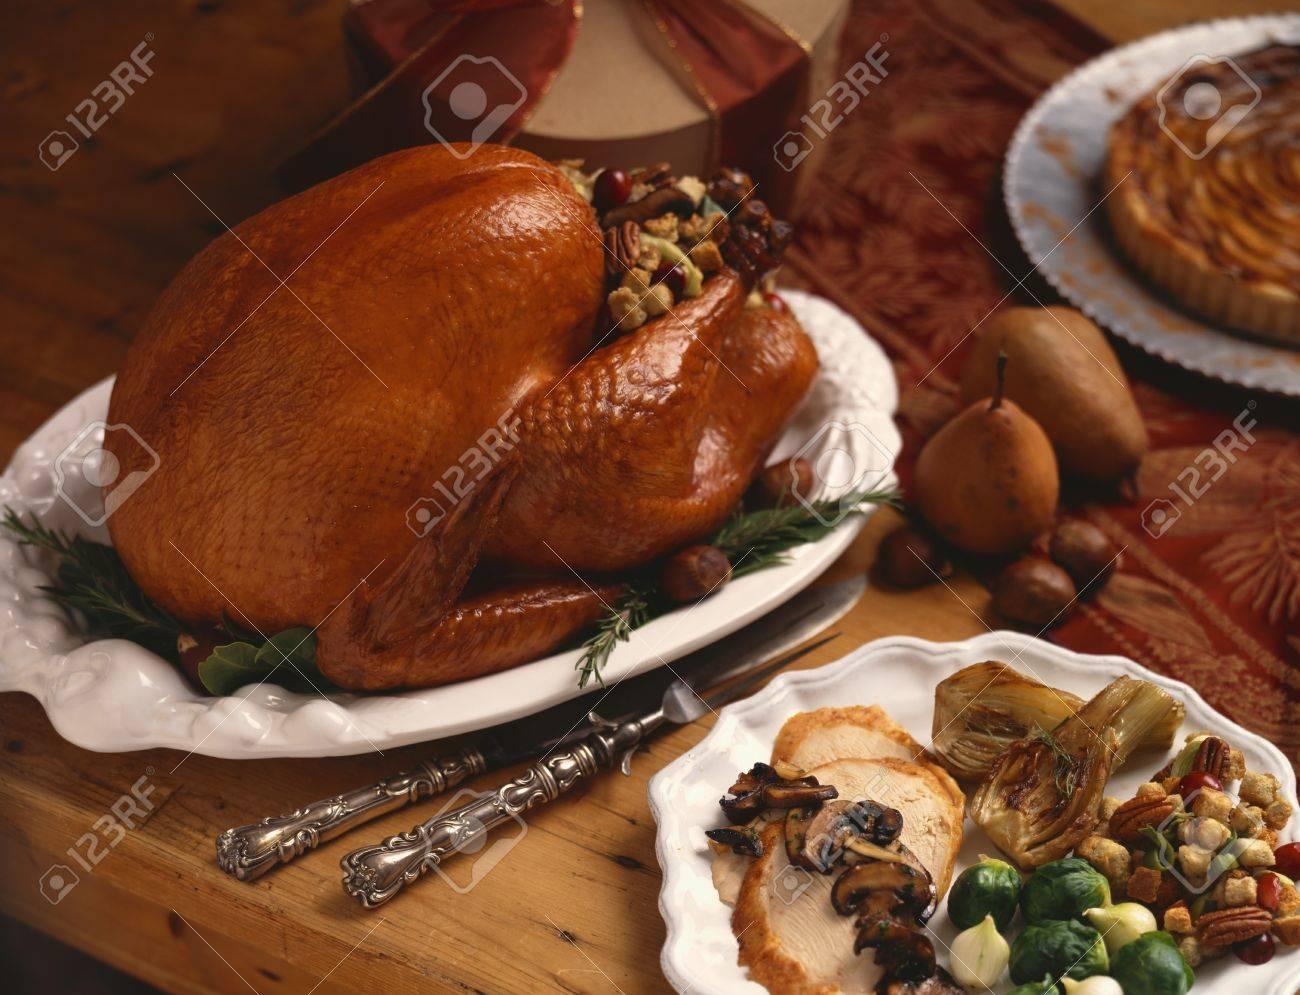 Stock Photo - Stuffed Roast Turkey. Sliced Turkey Dinner Plate & Stuffed Roast Turkey. Sliced Turkey Dinner Plate Stock Photo ...